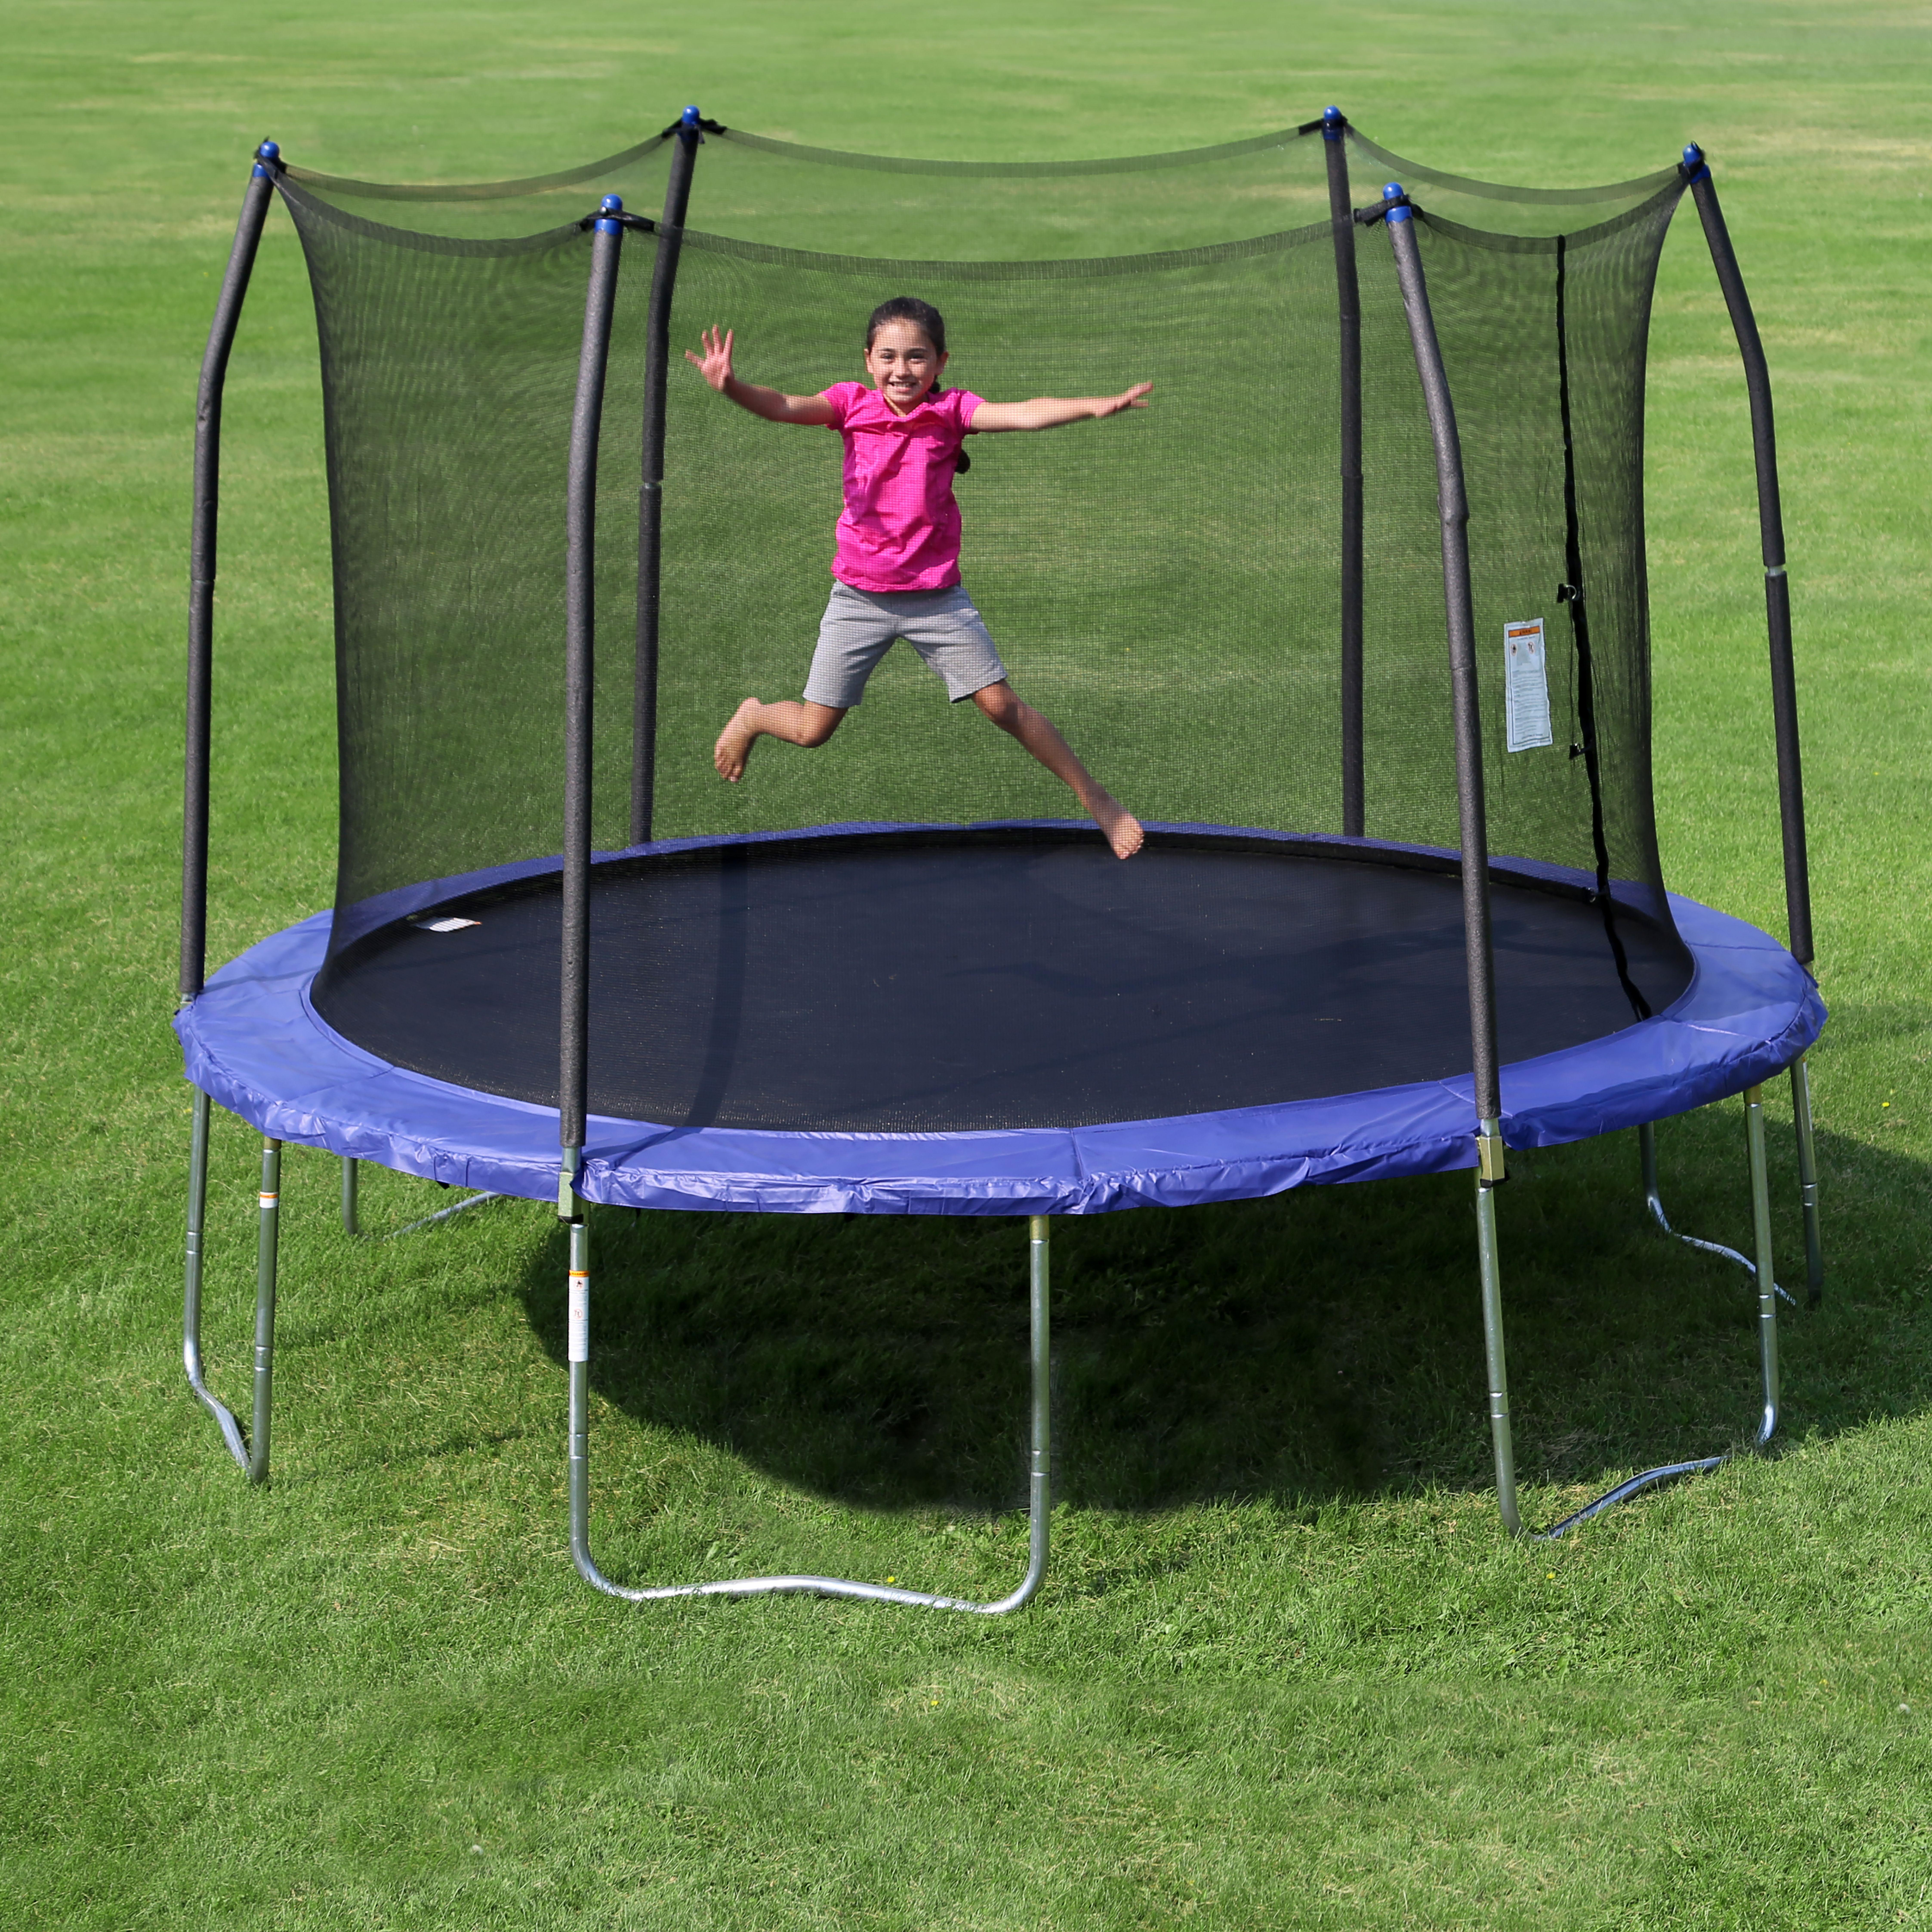 skywalker trampolines 14 u0026apos round trampoline and enclosure with